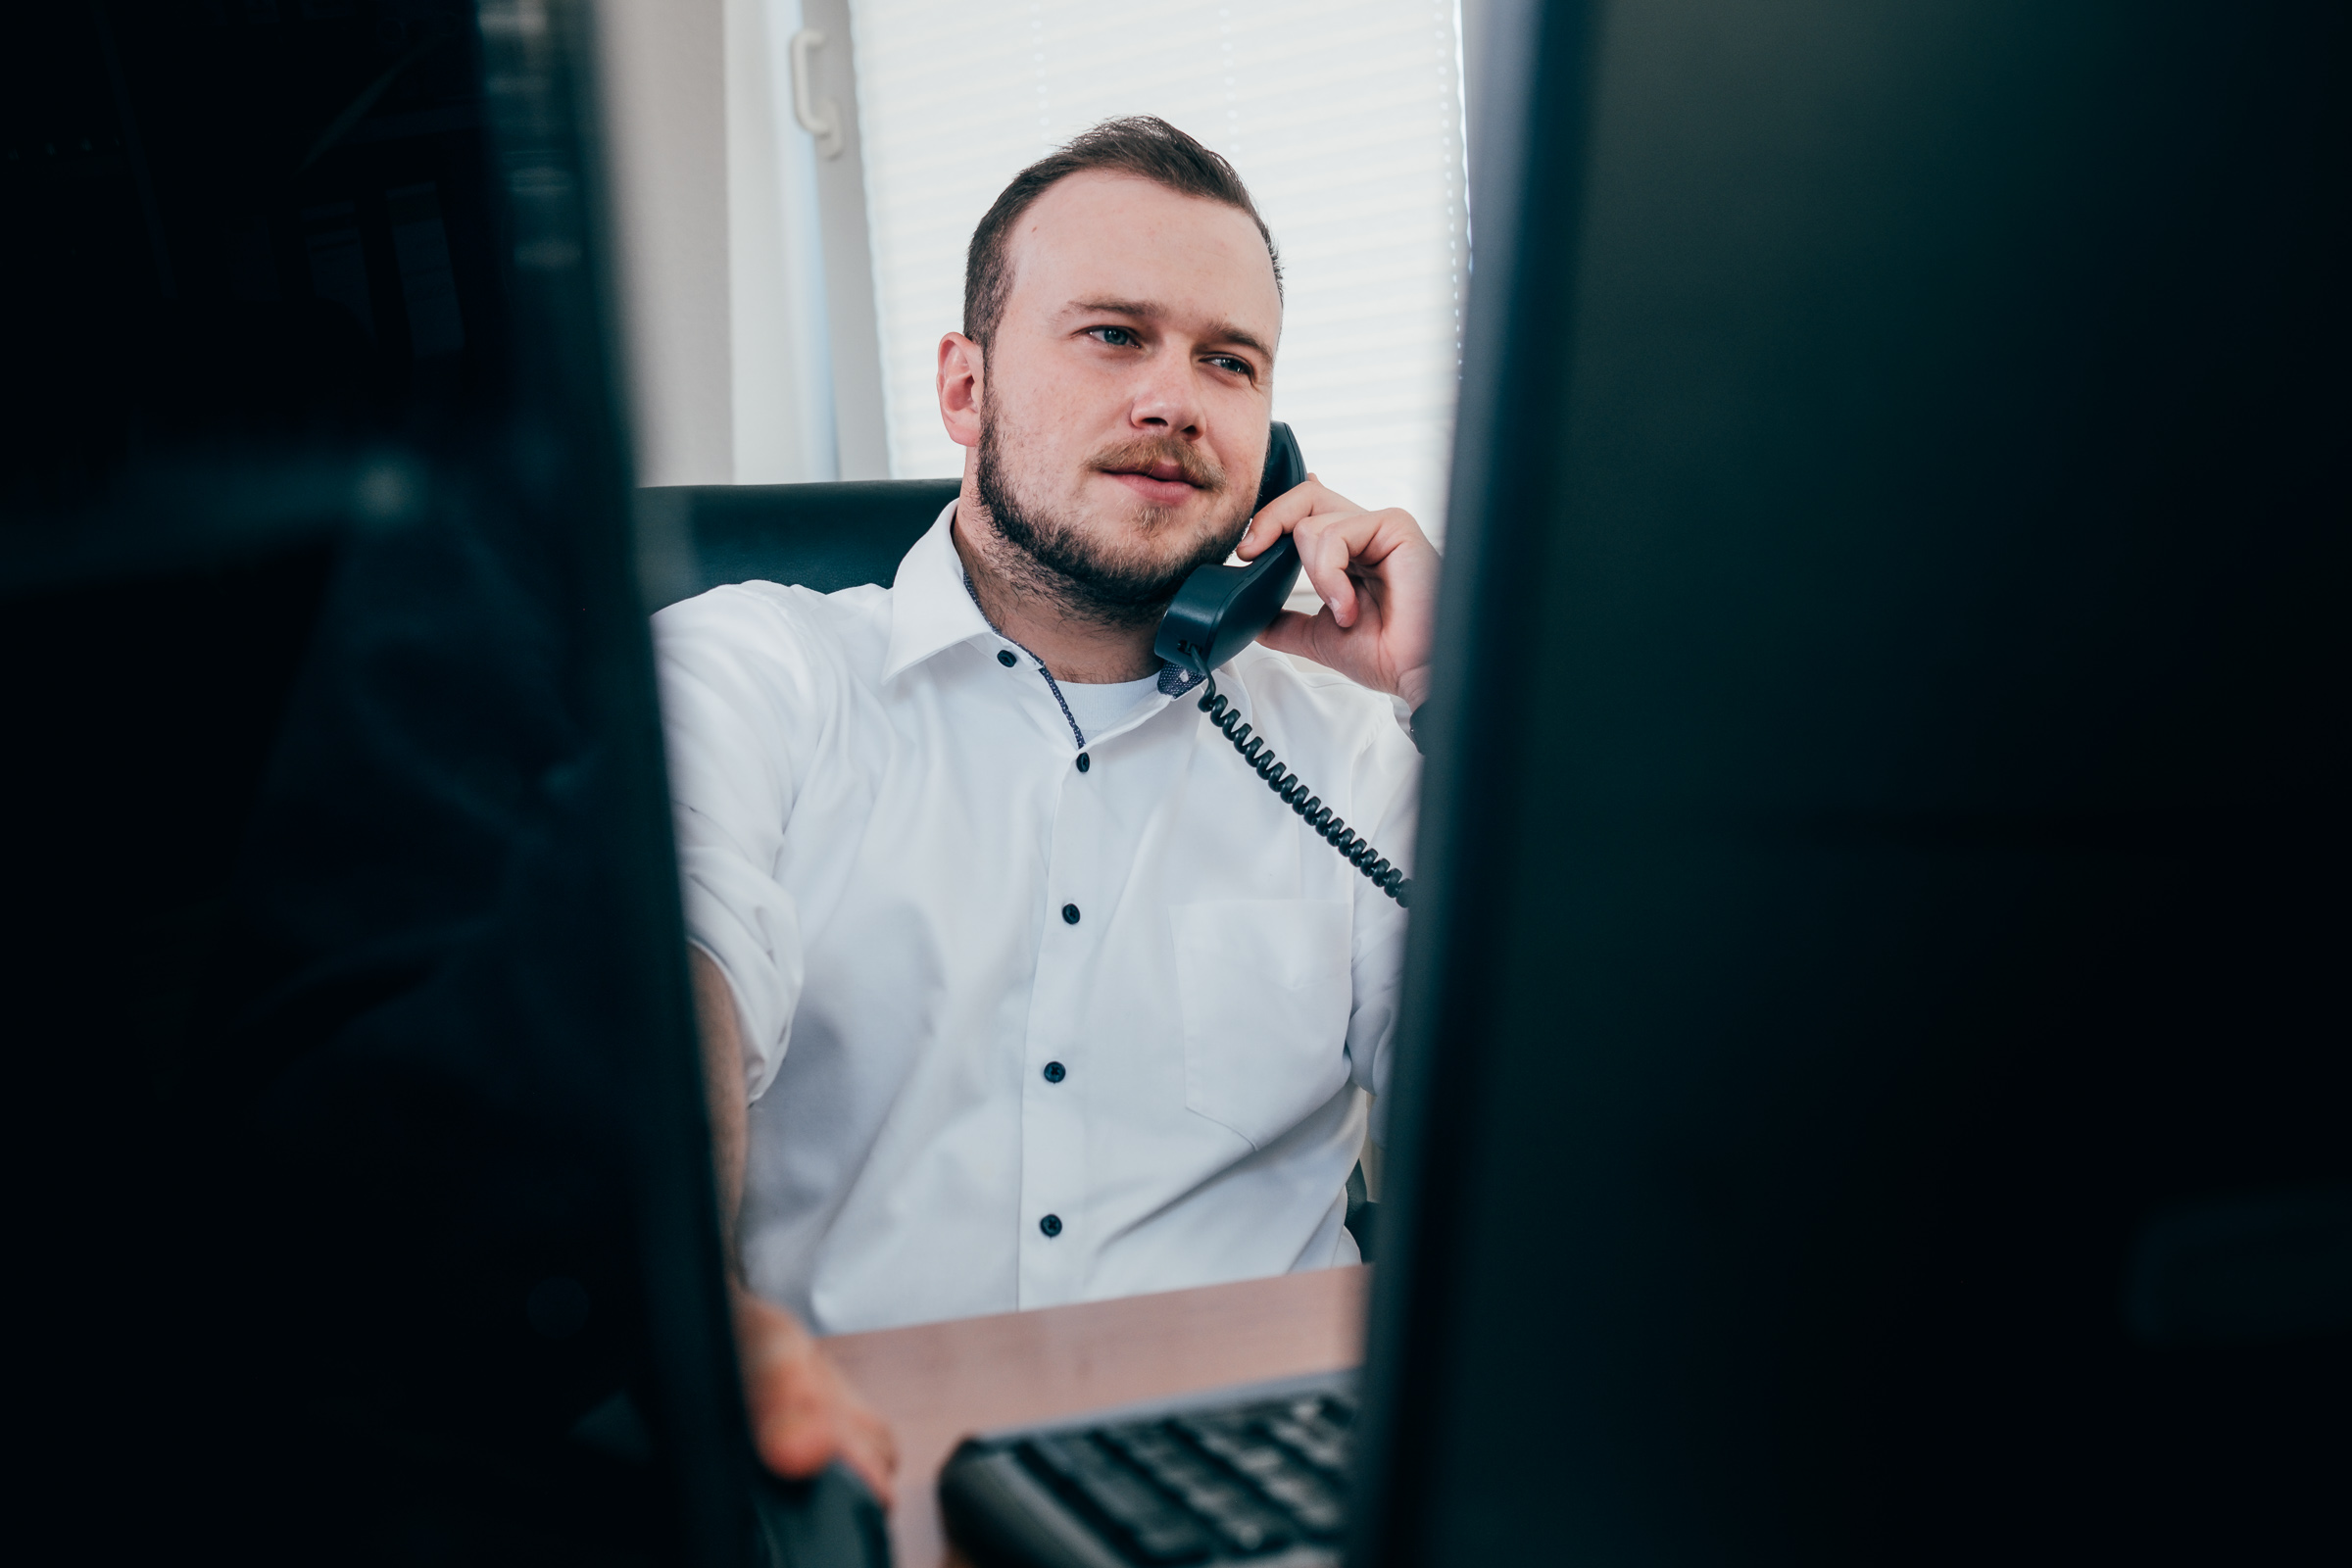 Sven Schwierzy Rechtsanwaltskanzlei Gevelsberg Telefonische Beratung